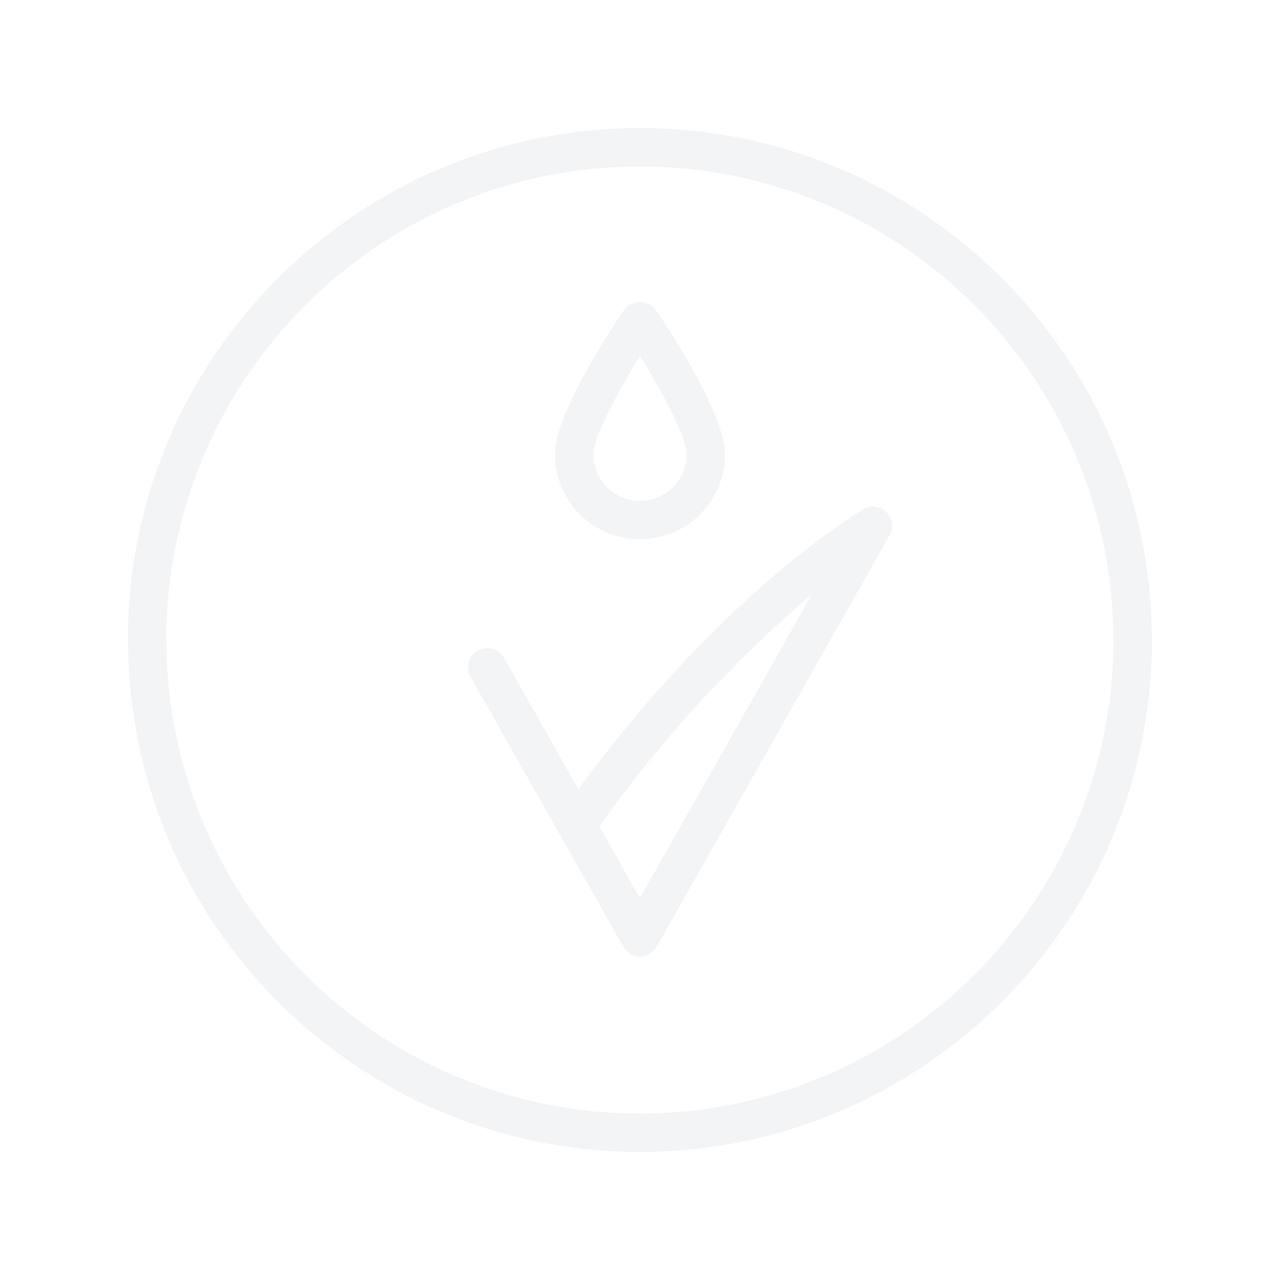 JUVENA Skin Energy Rich Moisture Cream 50ml